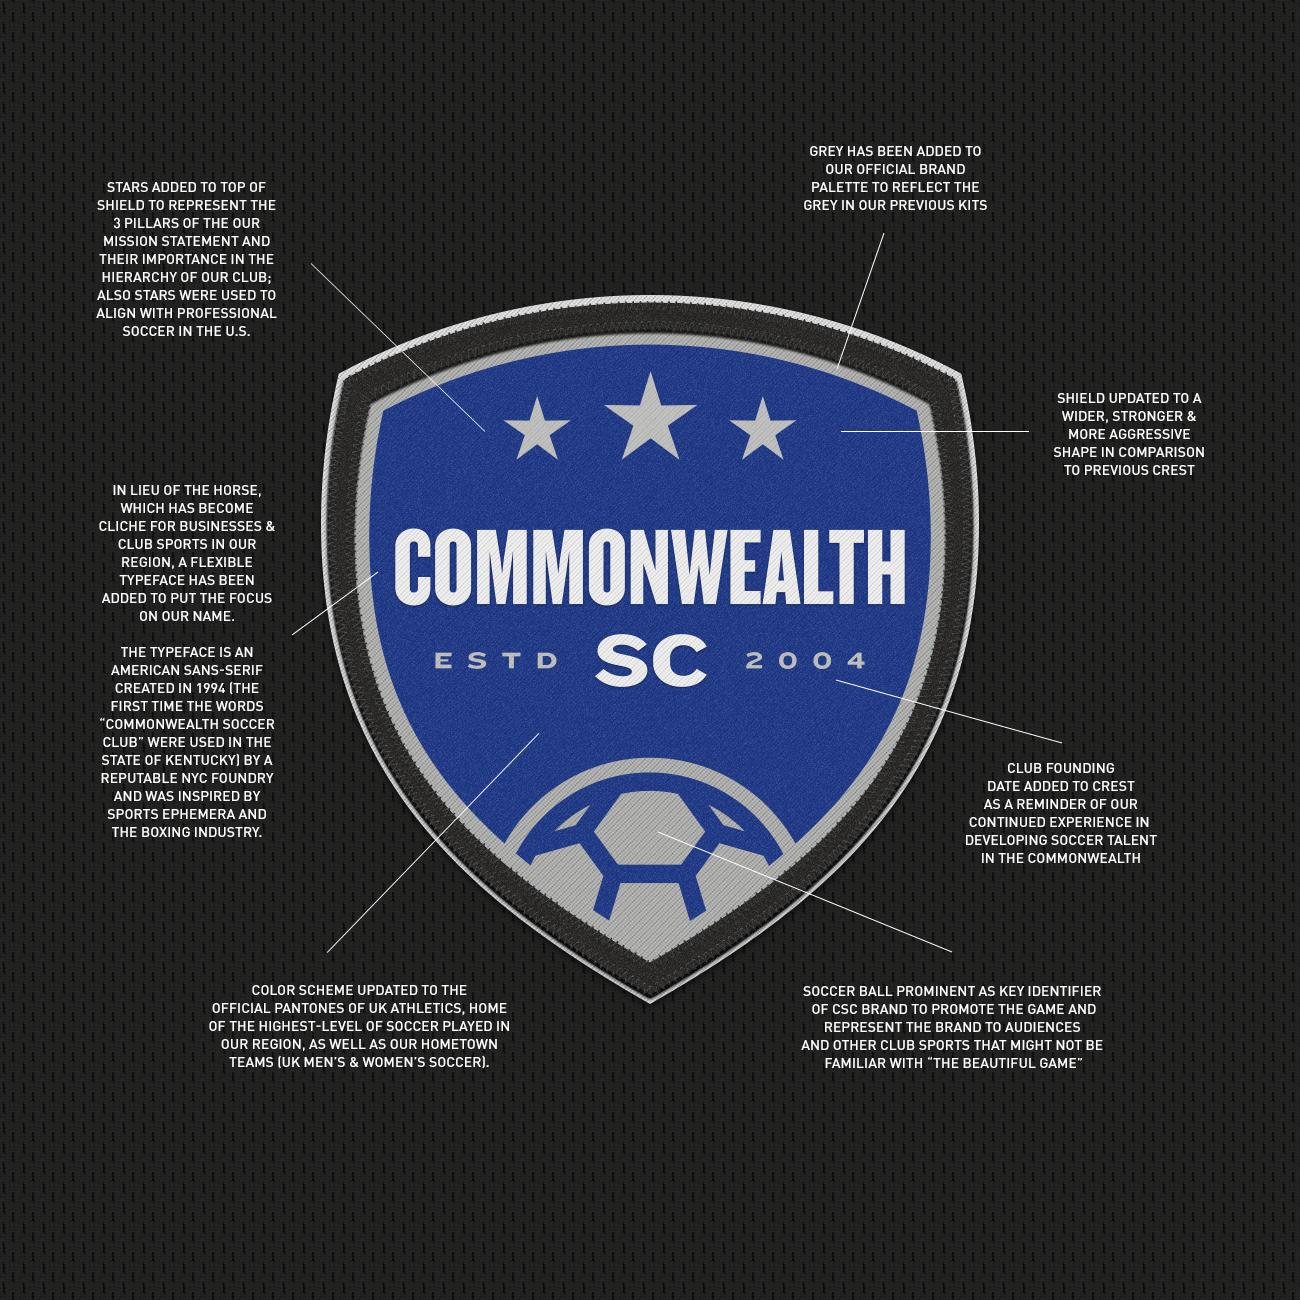 Csc logo explanation